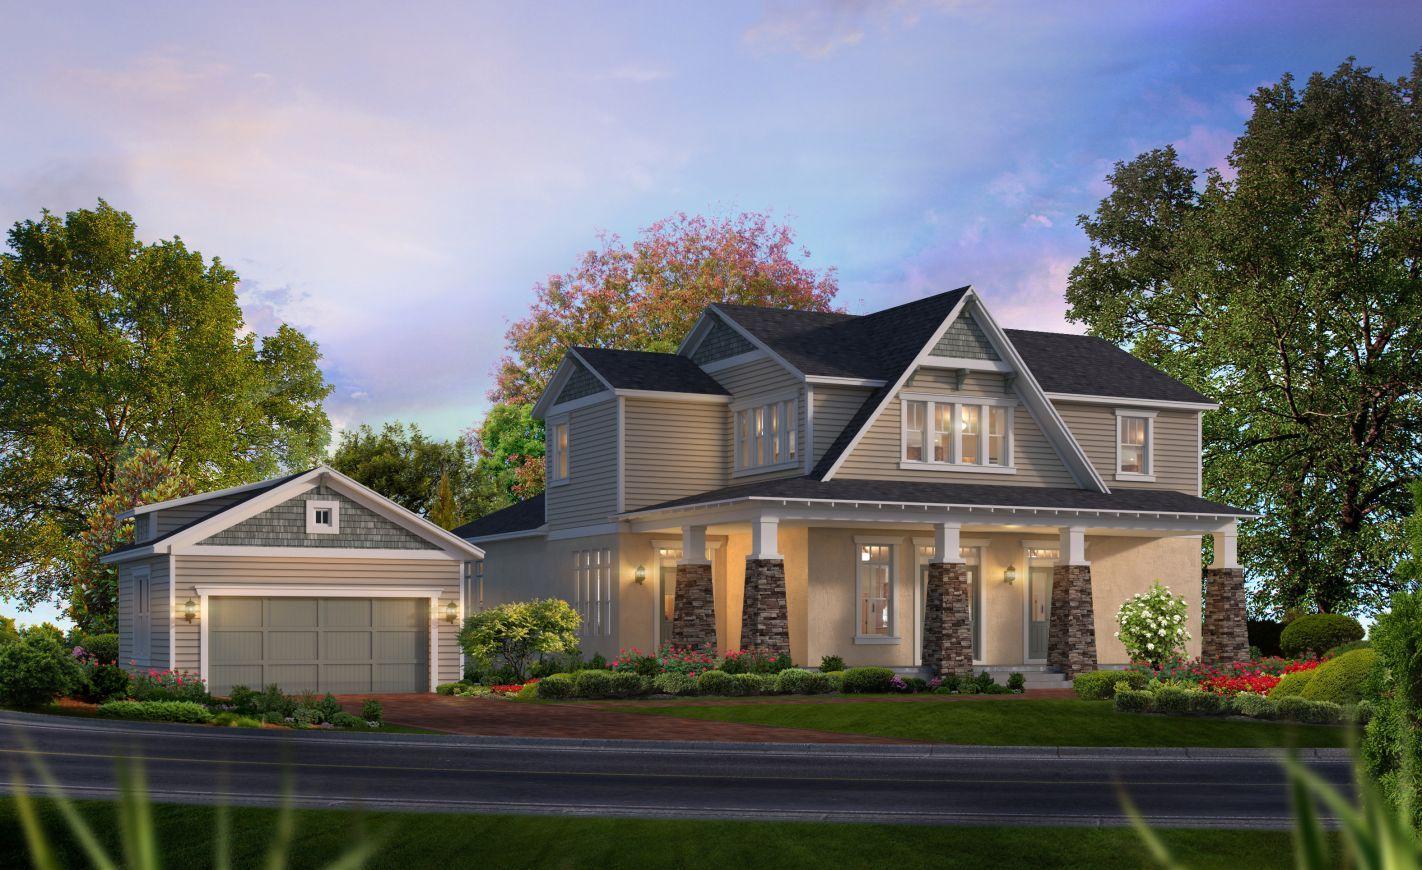 FishHawk, Fish Hawk, FL Homes & Land - Real Estate